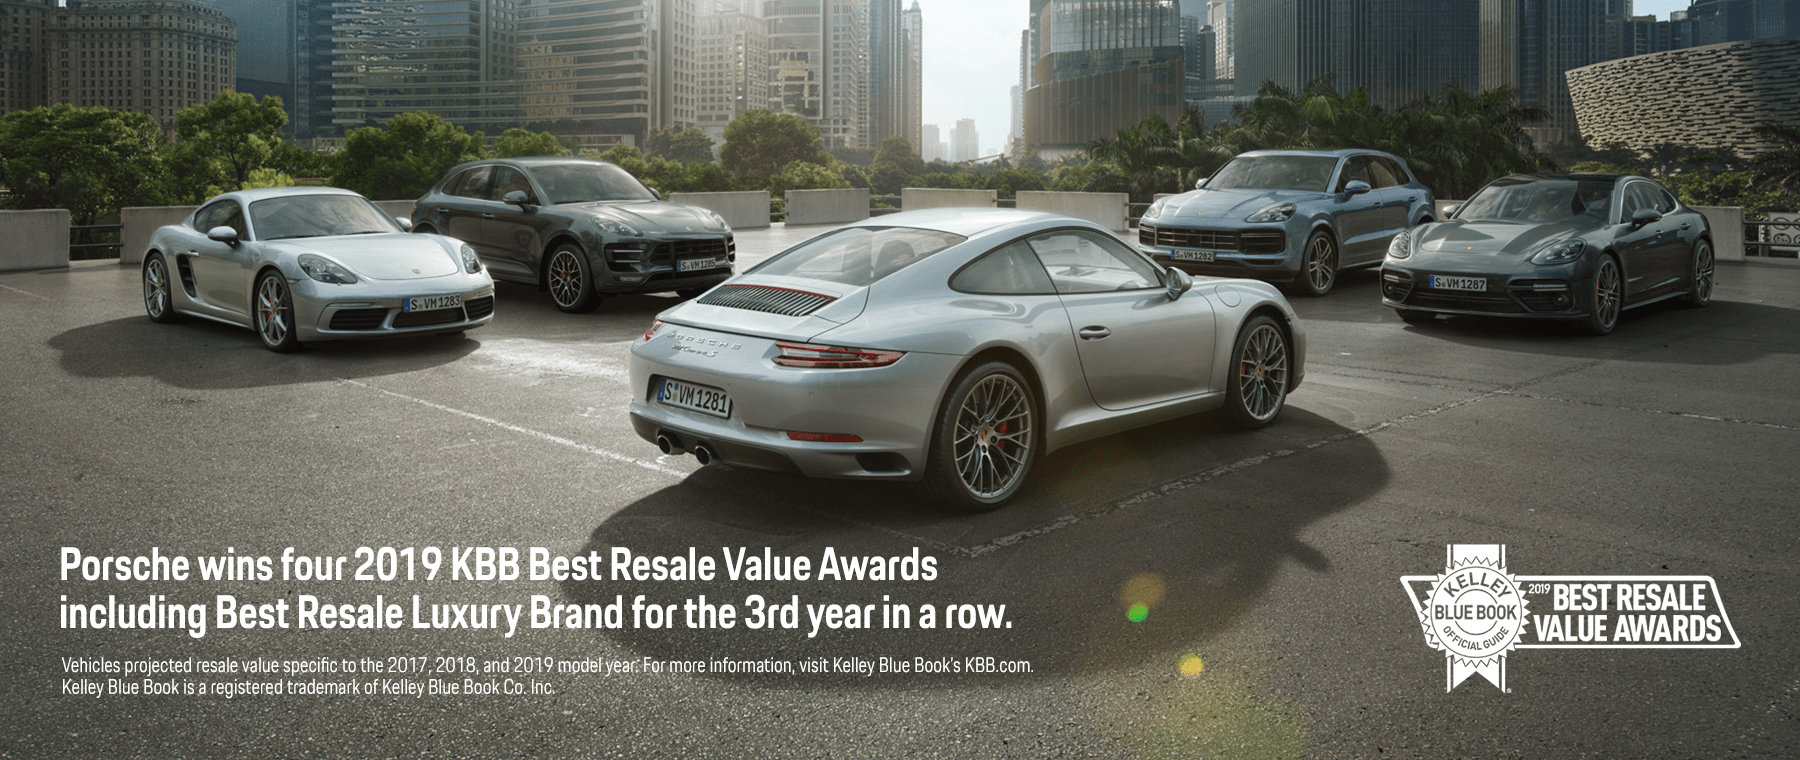 KBB best retail value award